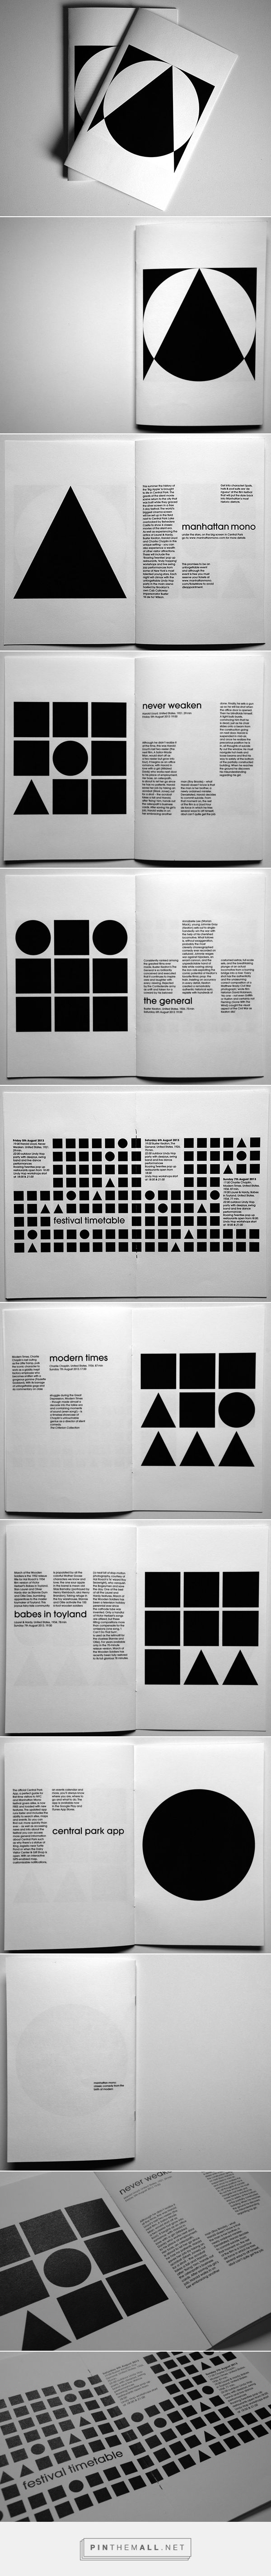 218 best cinema branding images on pinterest typography corporate